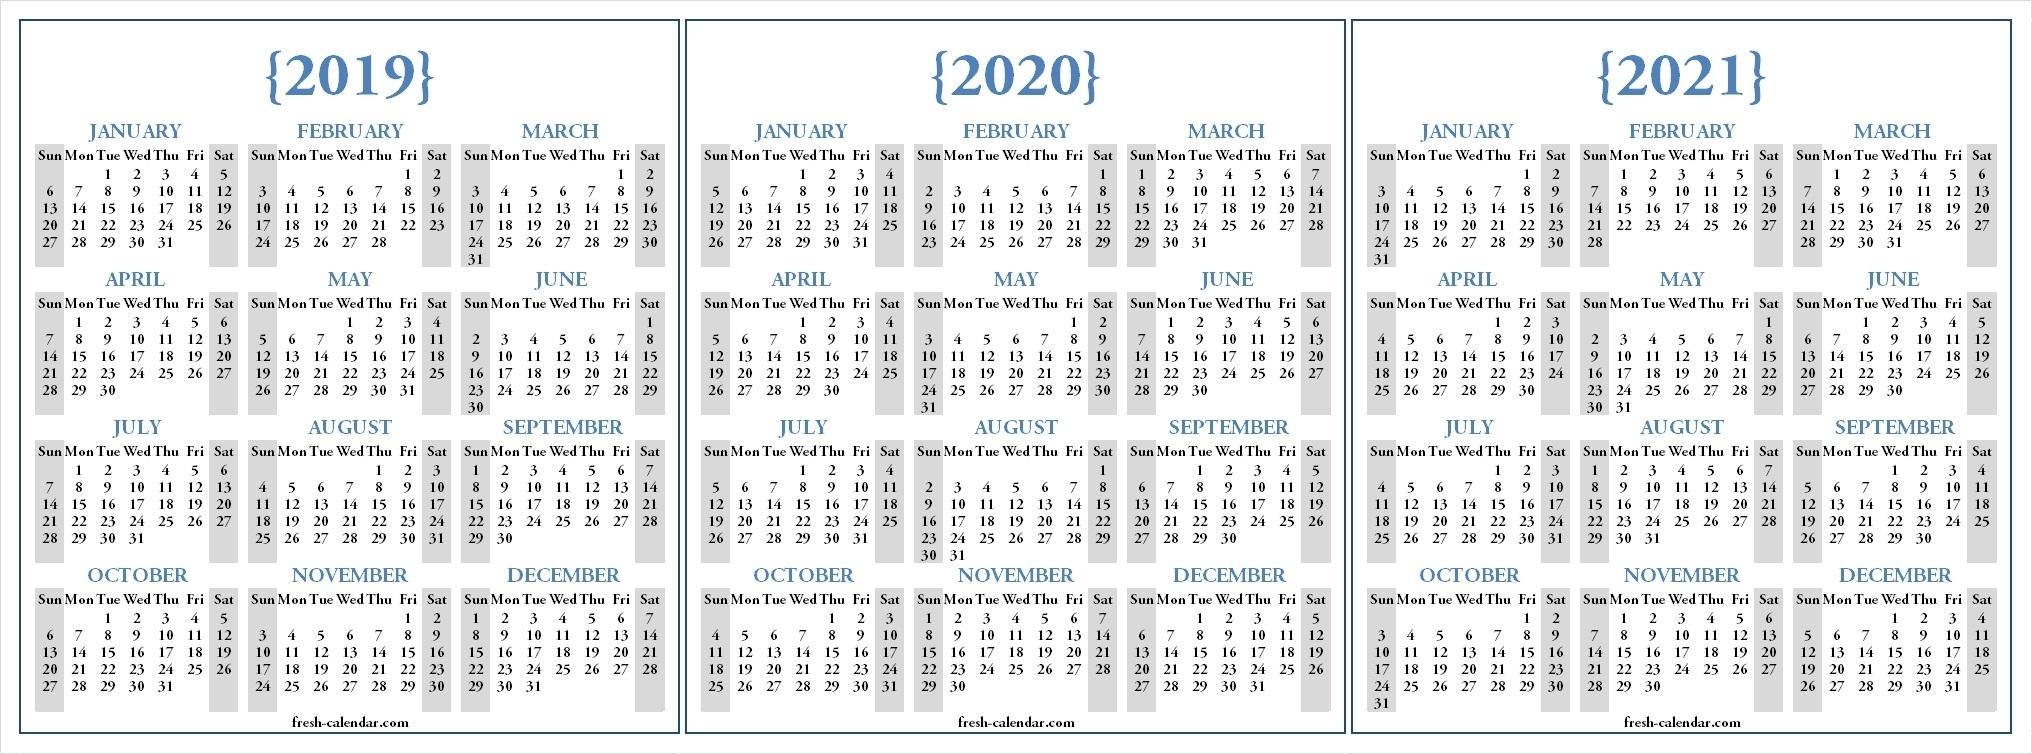 3 Year Calendars Printable - Togo.wpart.co